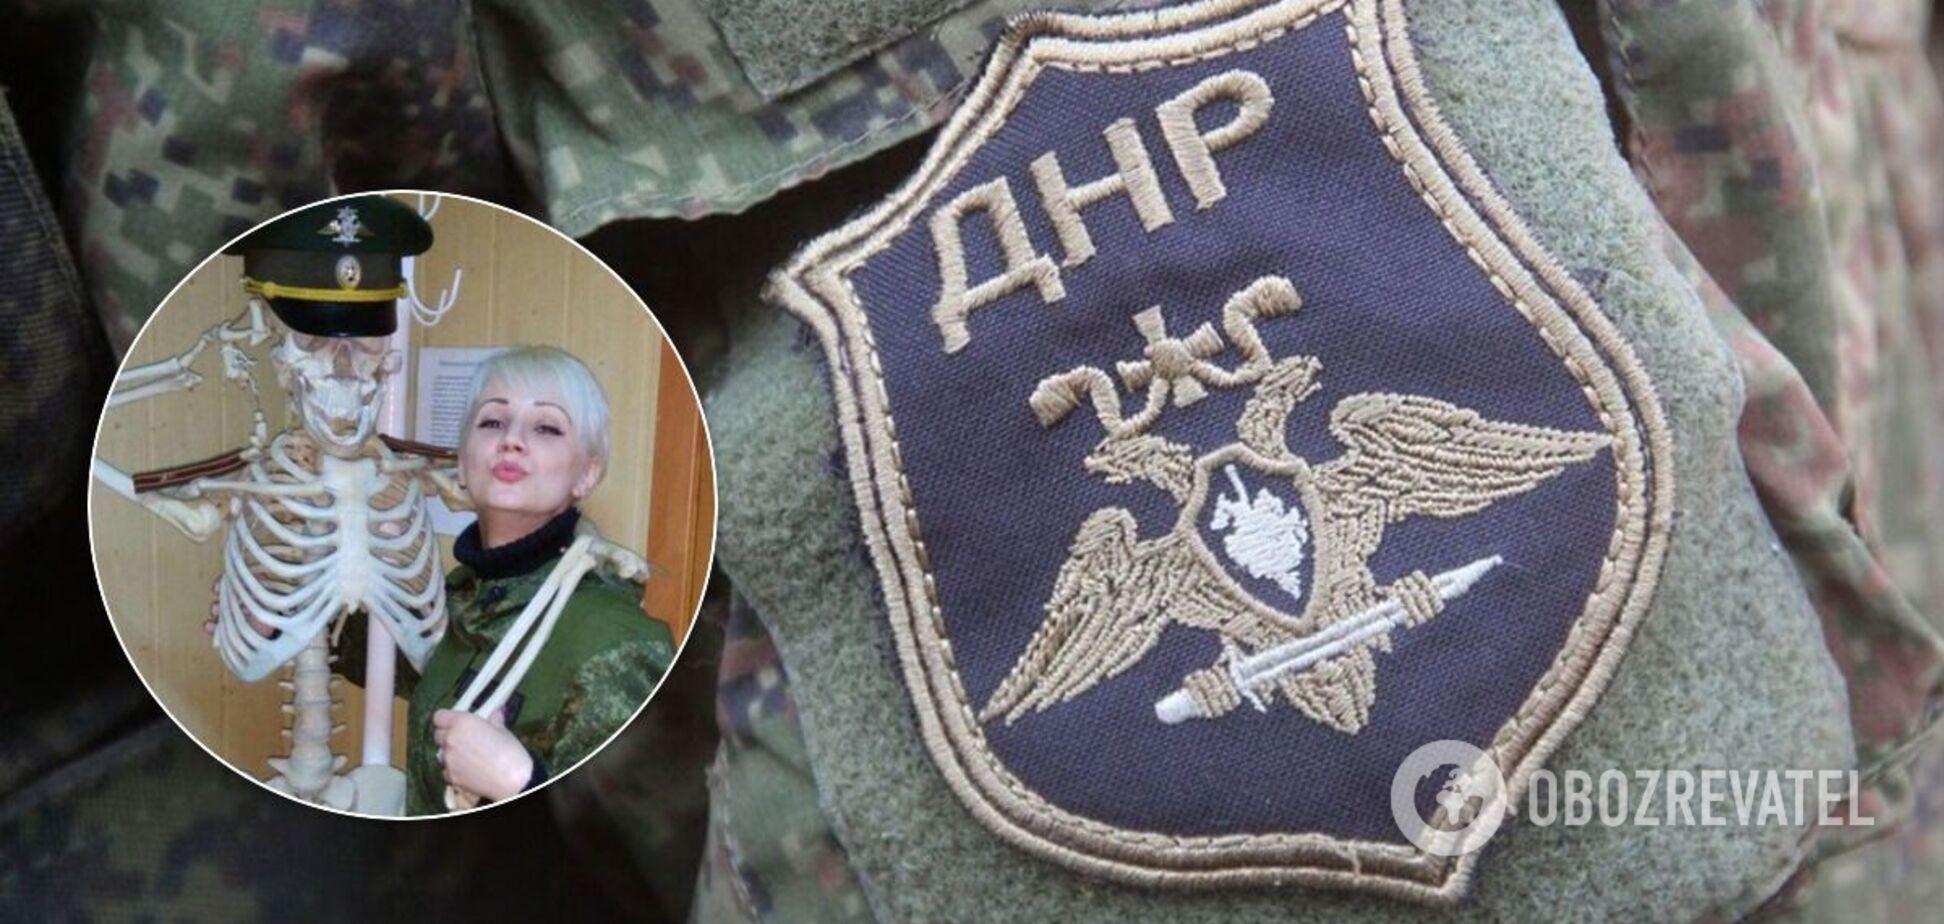 На Донбасі наклала на себе руки терористка Ольга Ярославцева